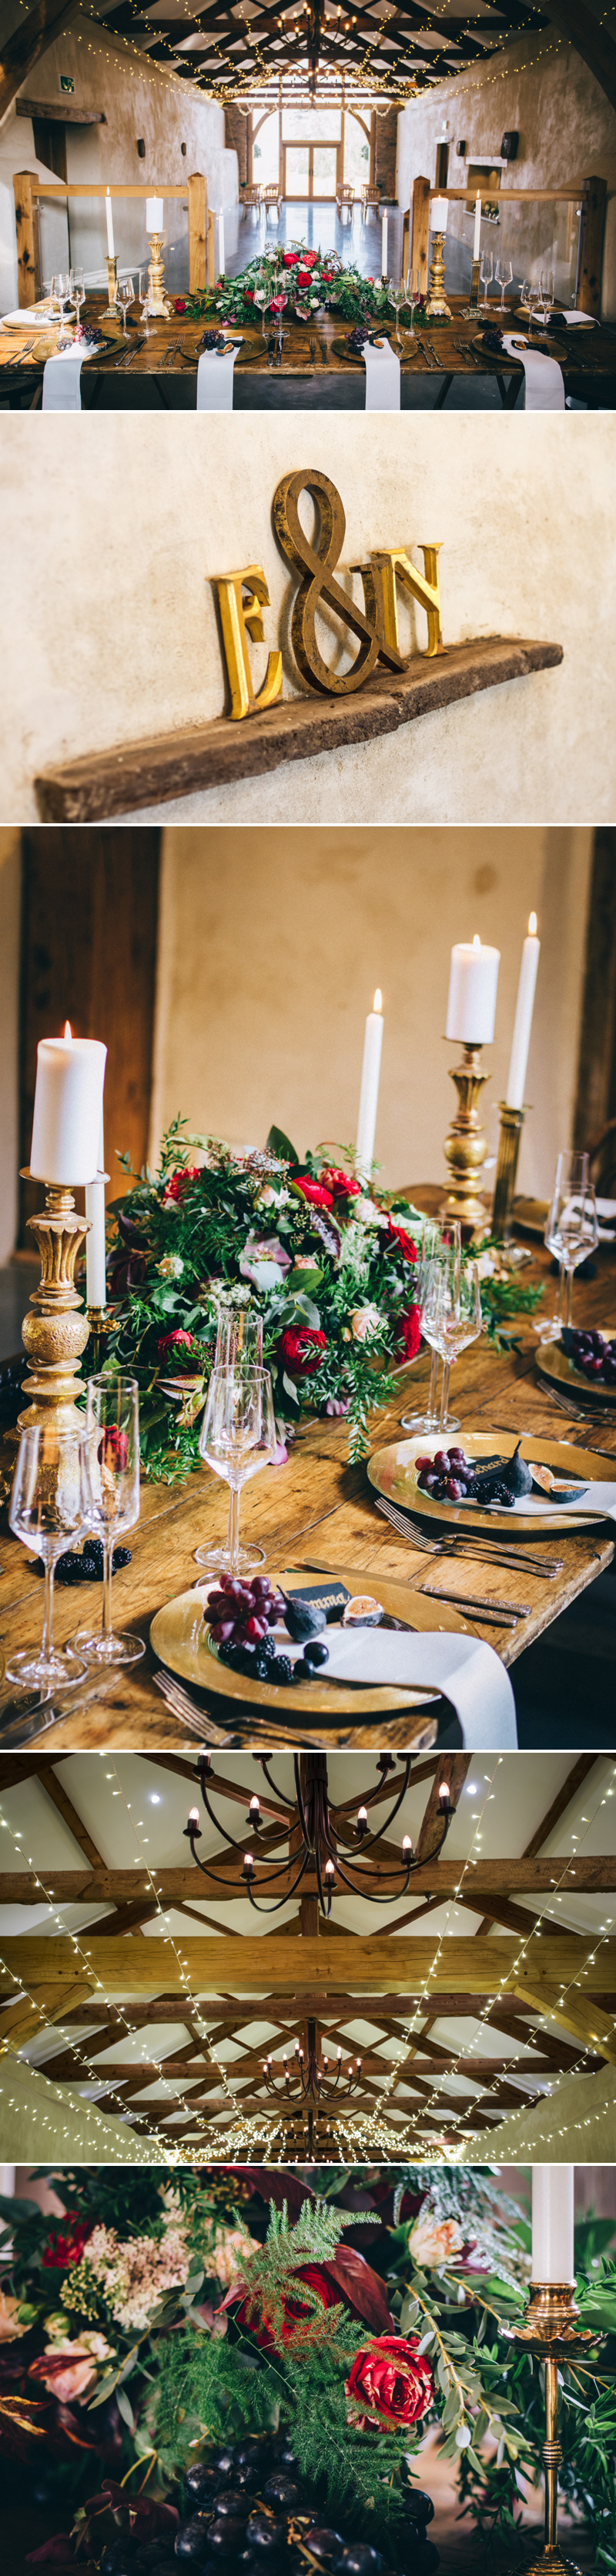 wedding-venues-in-devon-uk-wedding-venue-directory-upton-barn-and-walled-garden-marsala-inspired-styled-shoot-coco-wedding-venues-001